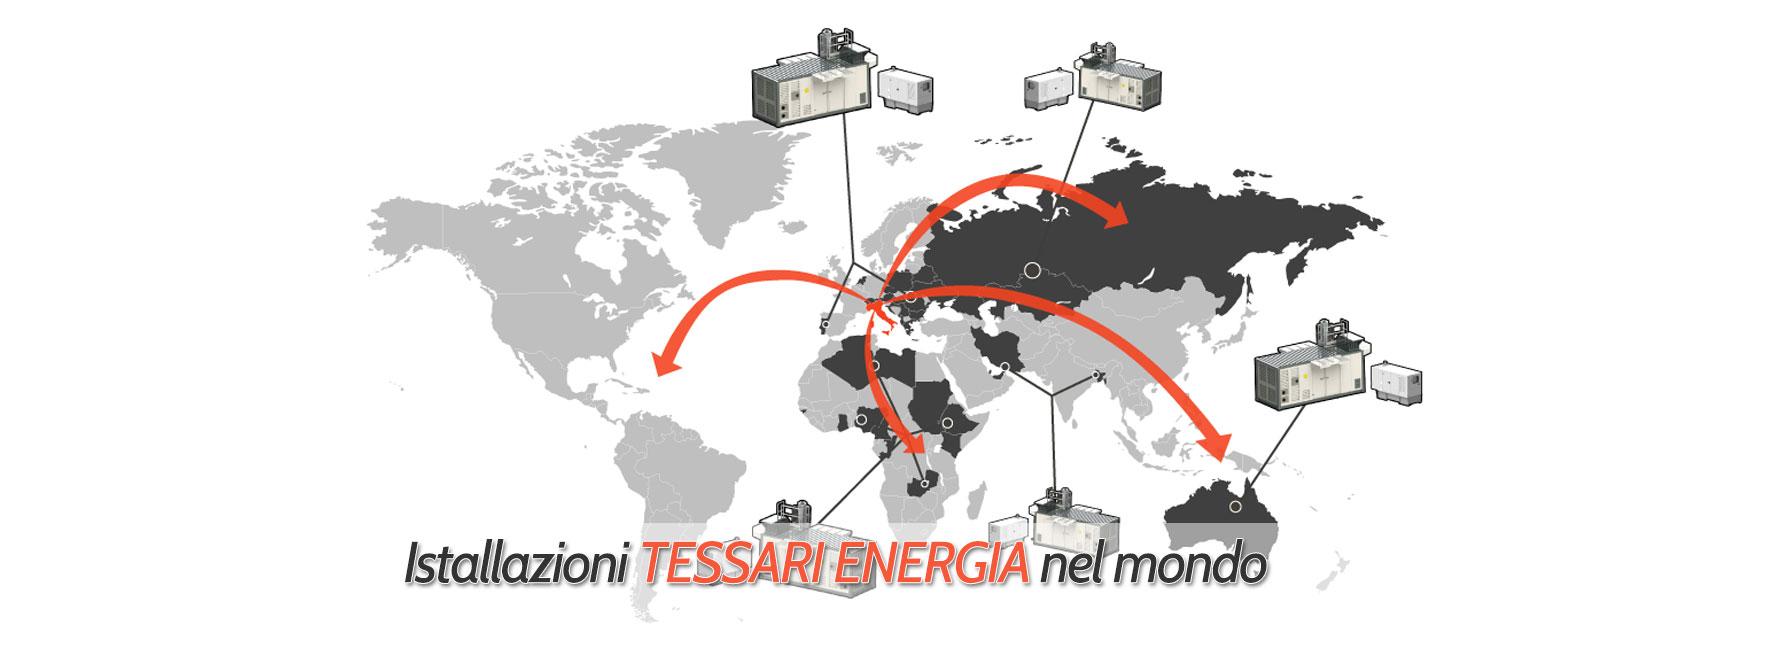 slider-inatallazioni-tessari-energia-nel-mondo_v2